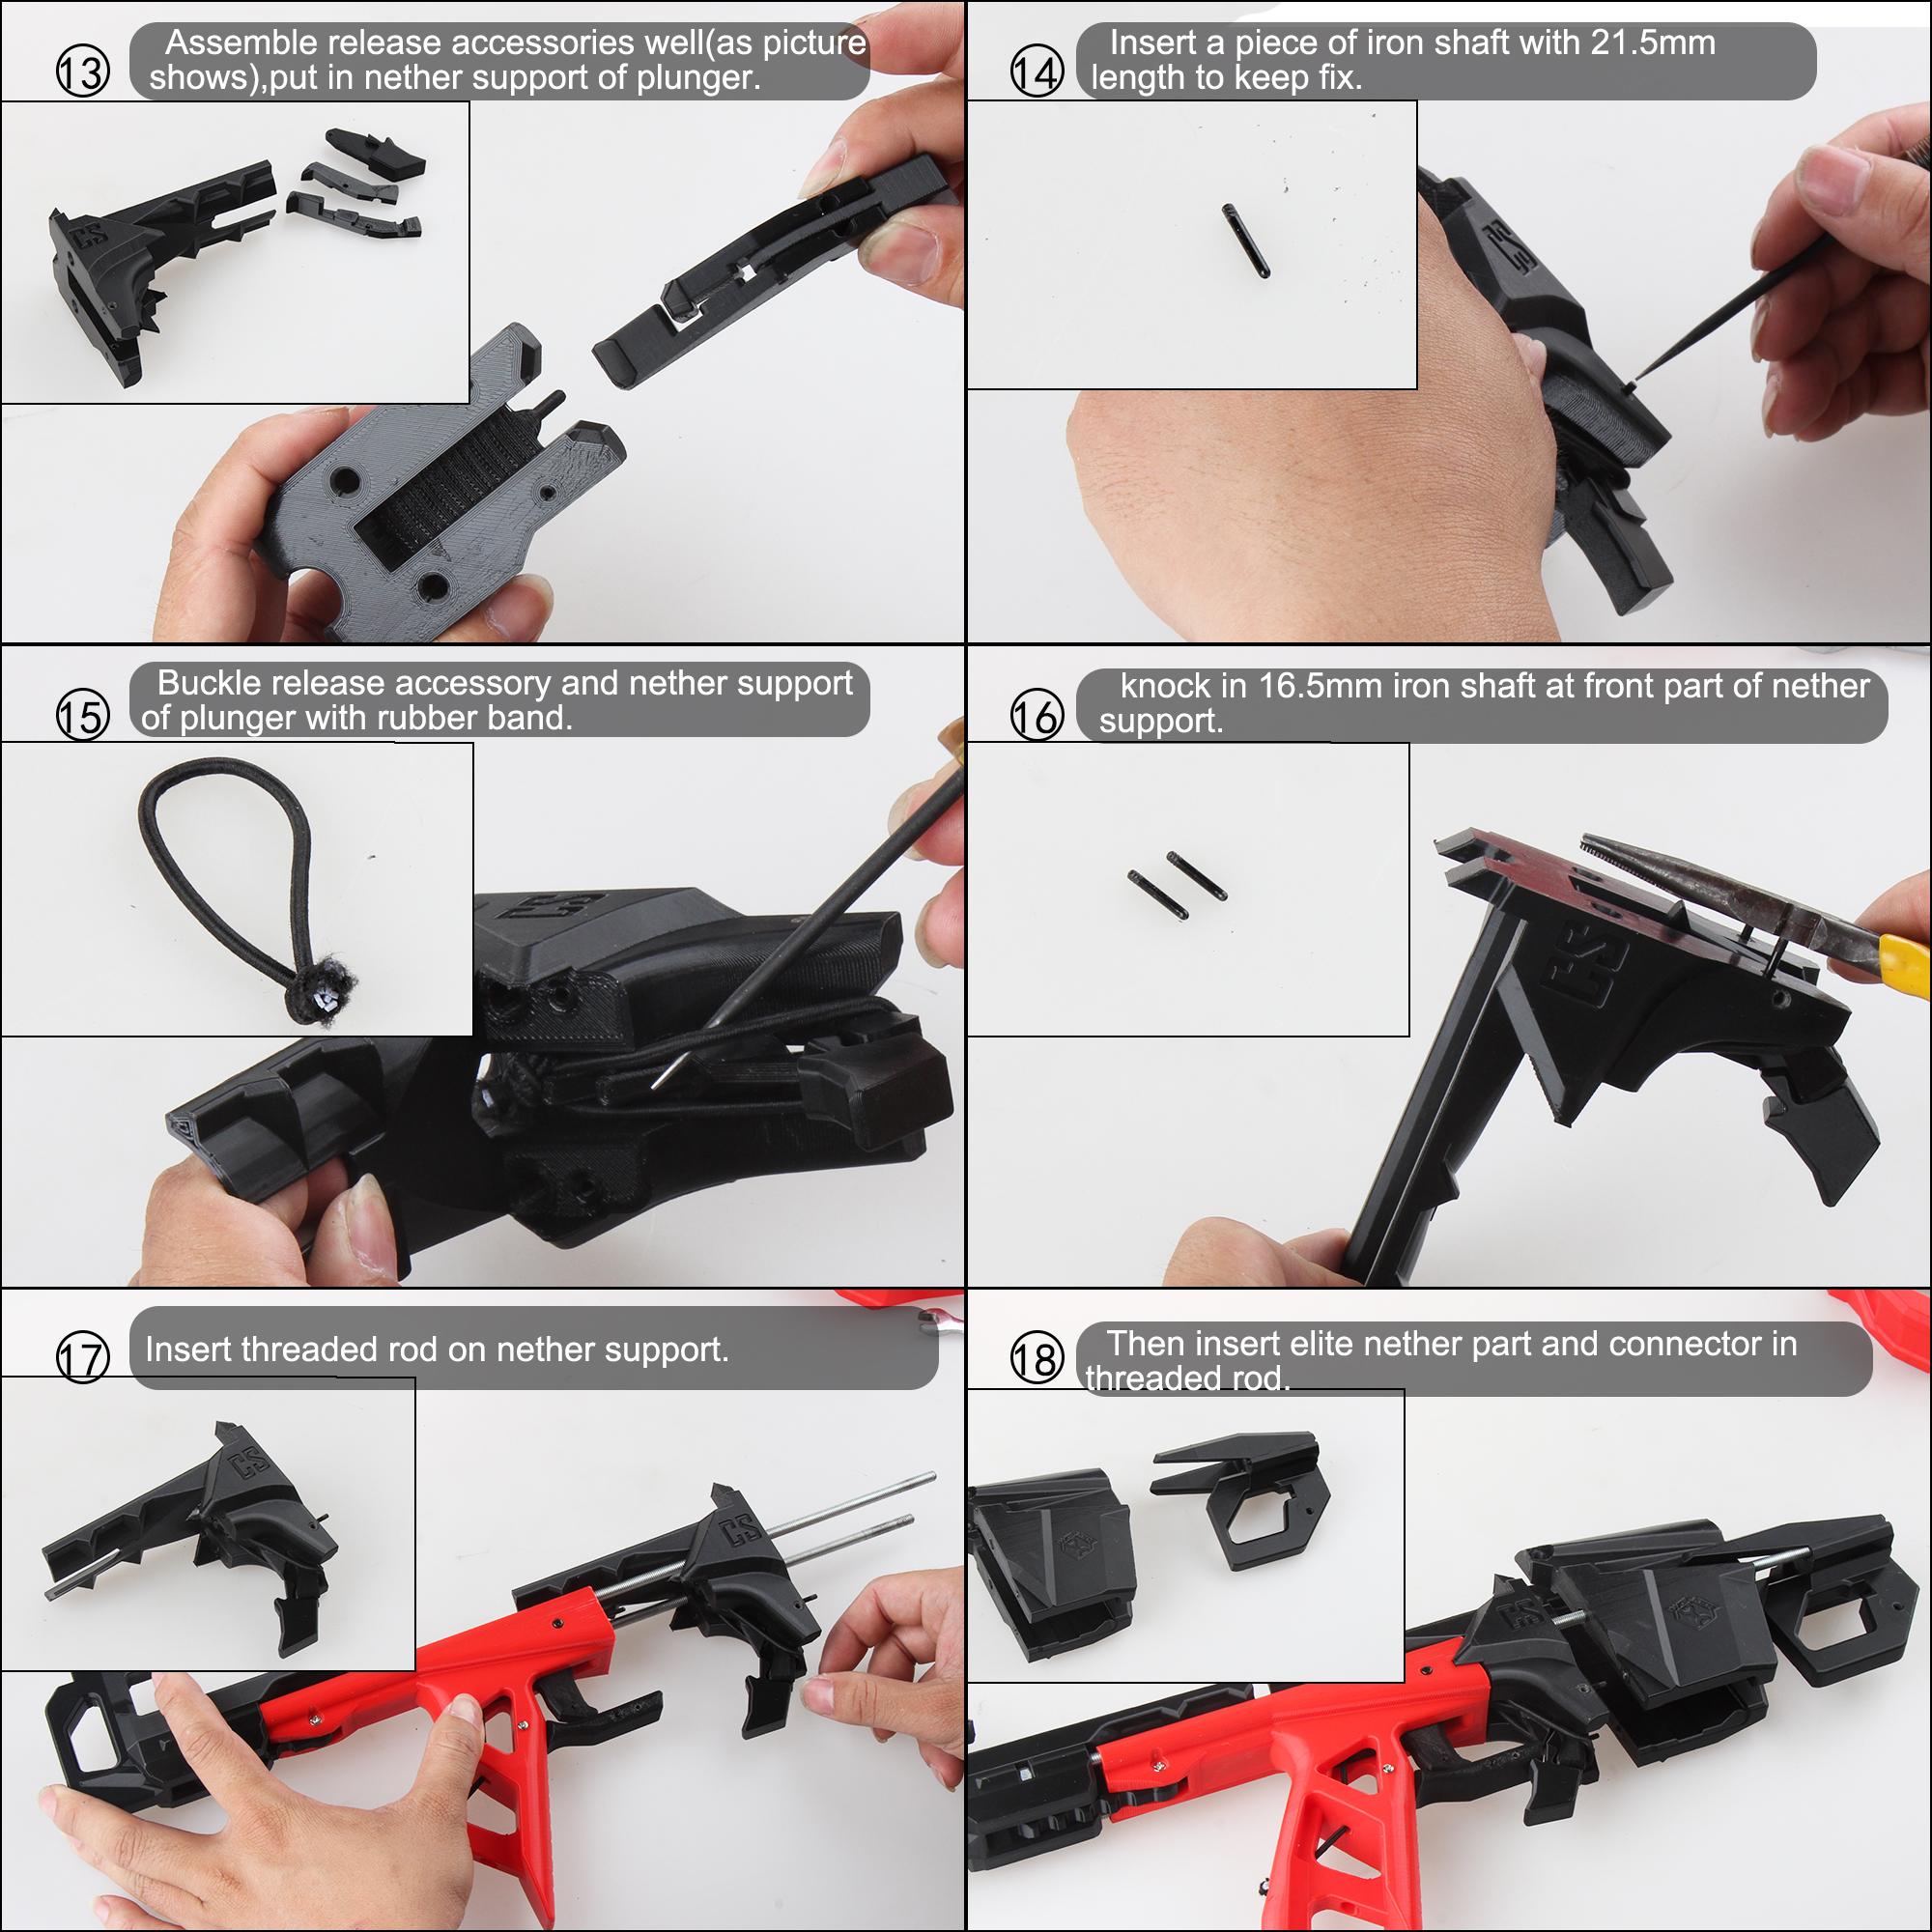 Worker F10555 Esper 3D printed Blaster Model B Assembly Instructions